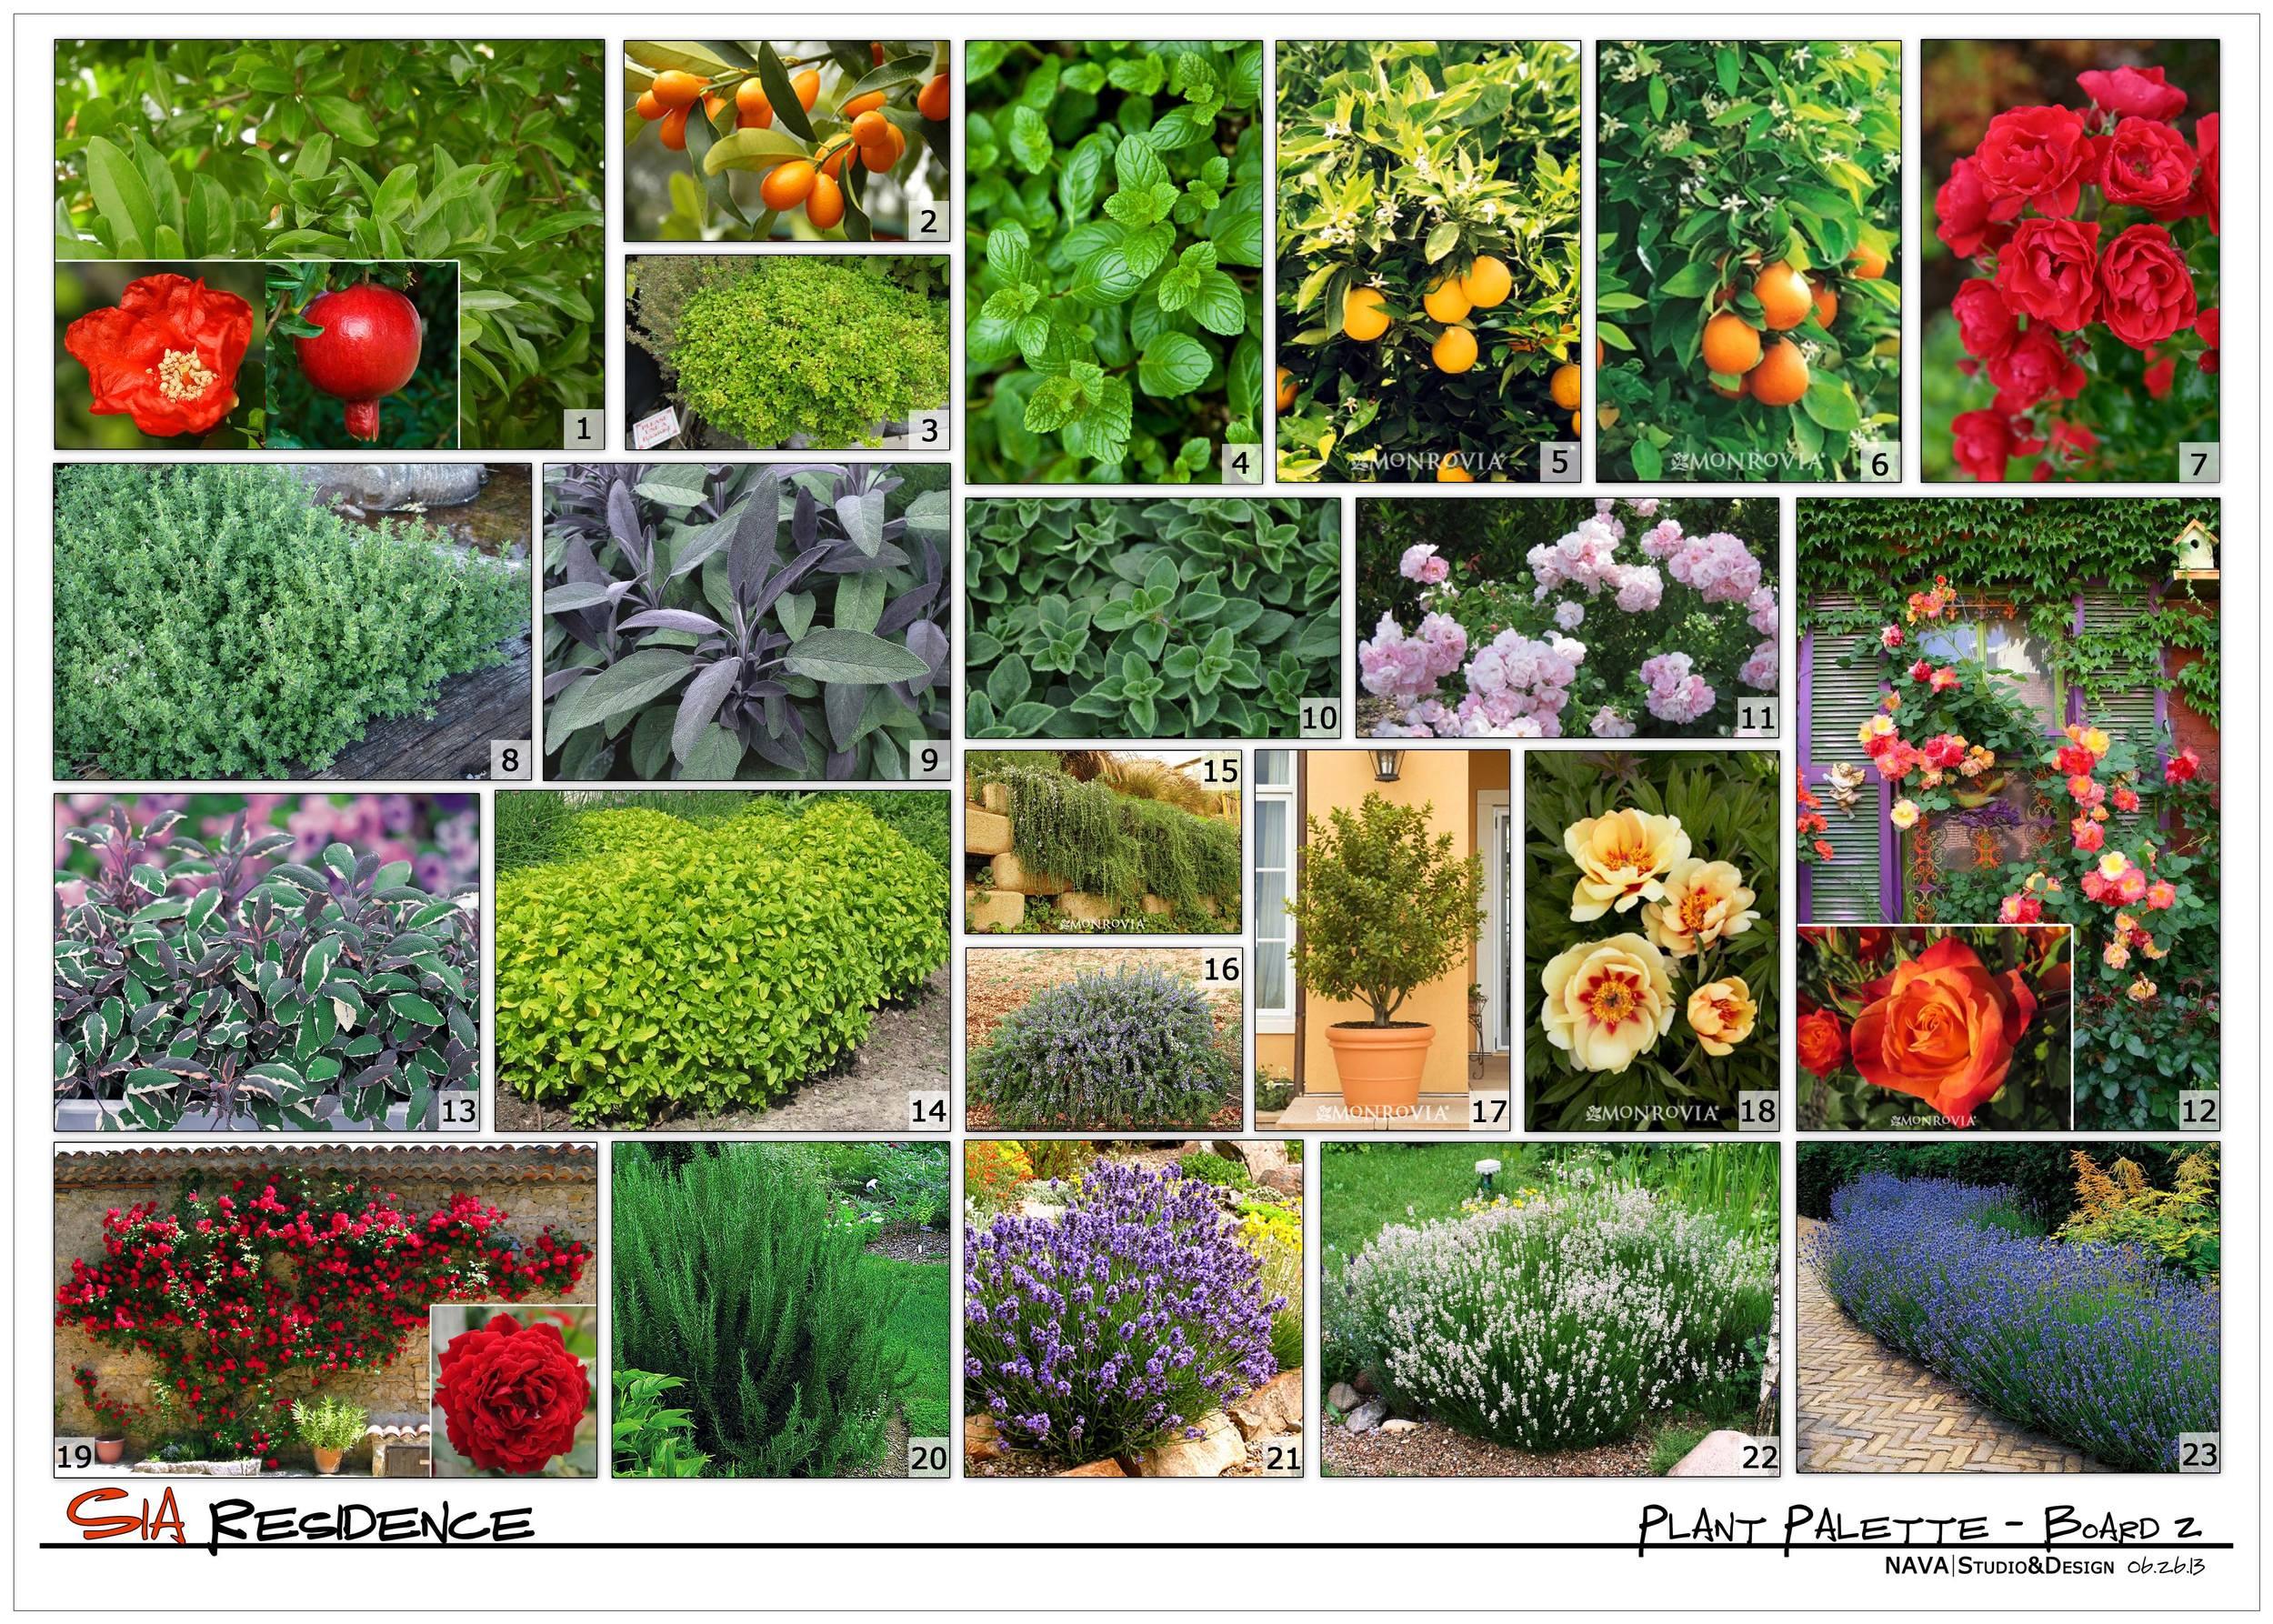 Conceptual Plant Palette_Board 2.jpg